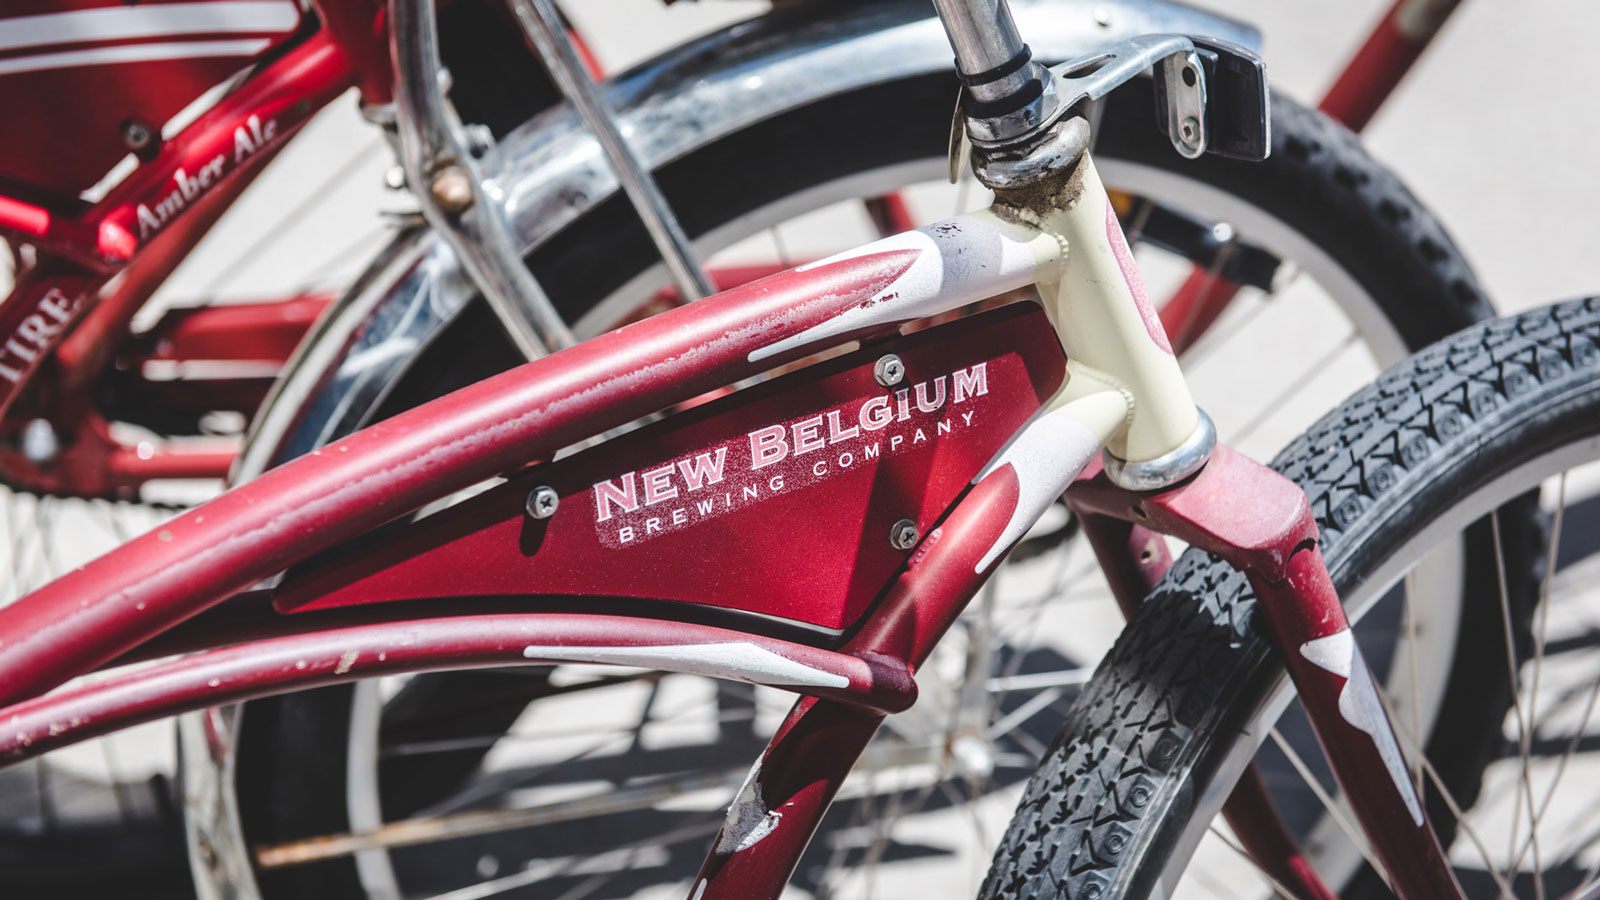 The history of New Belgium Brewing | New Belgium Brewing